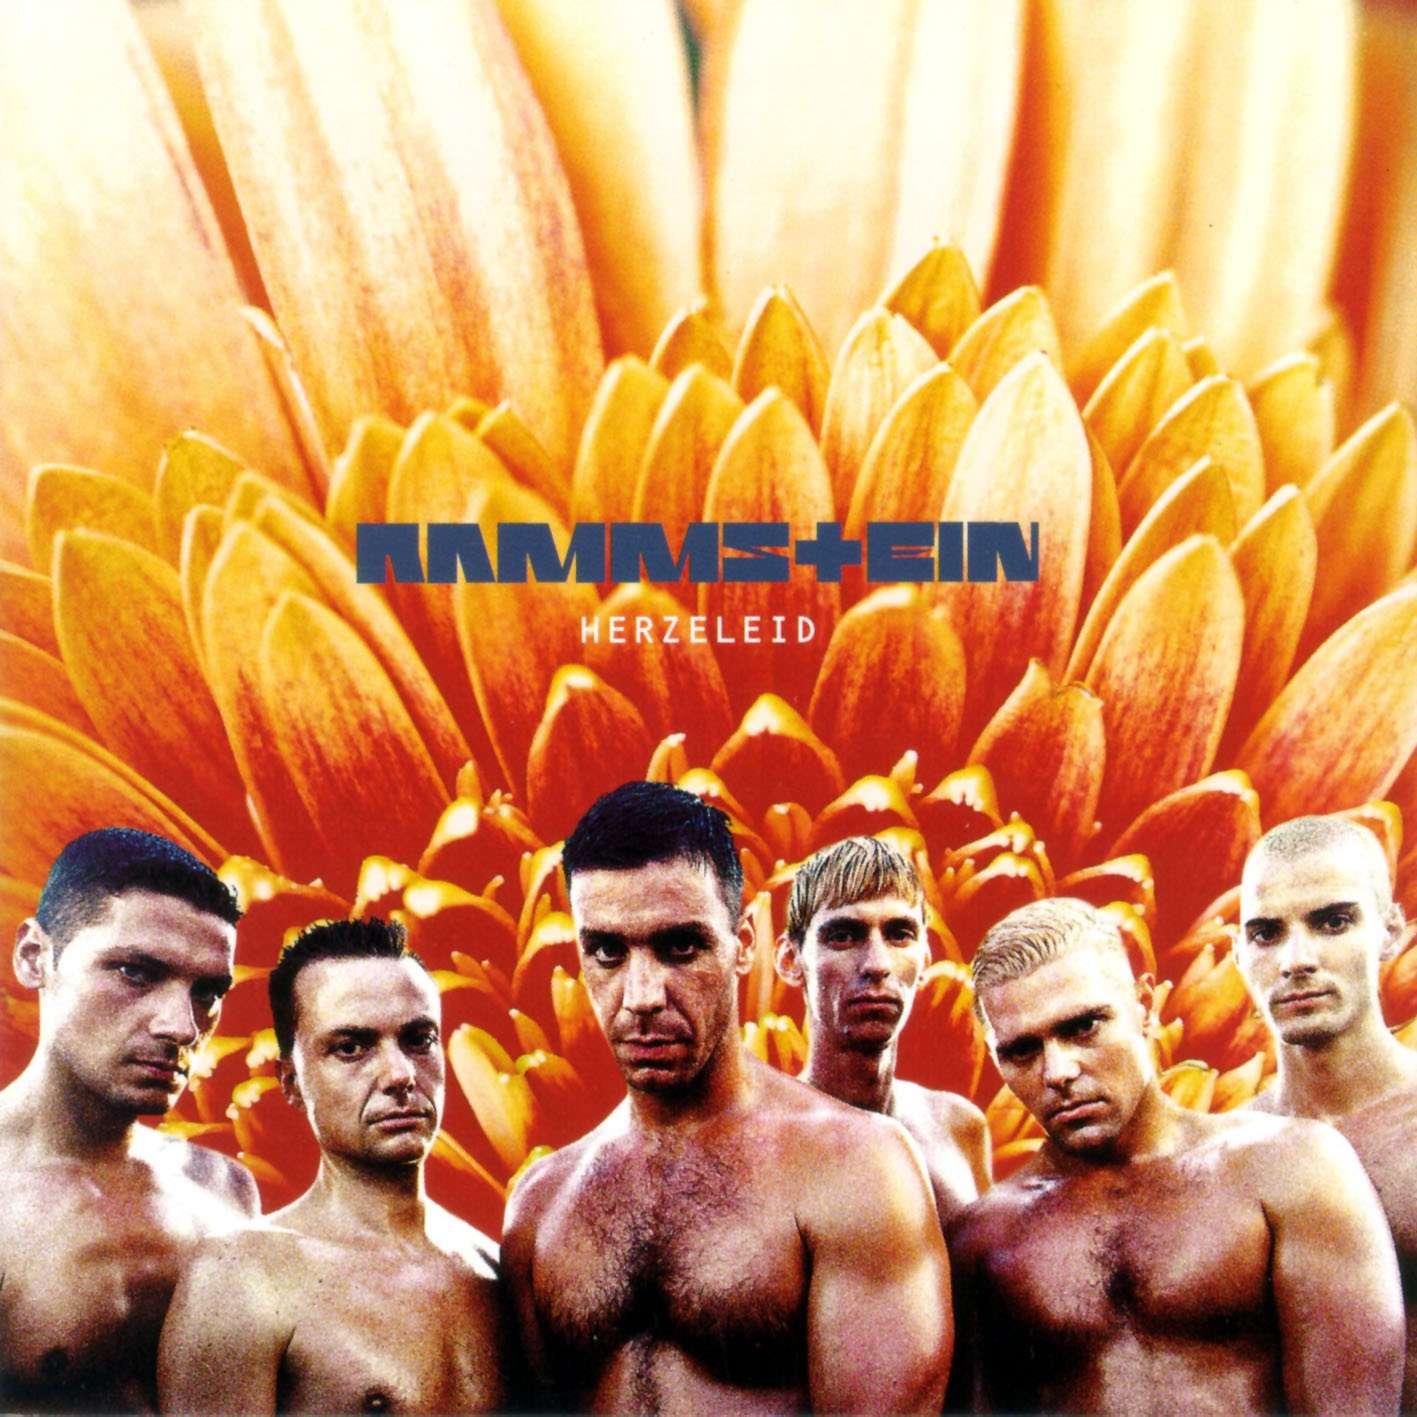 Rammstein - Rammstein 1998-2005